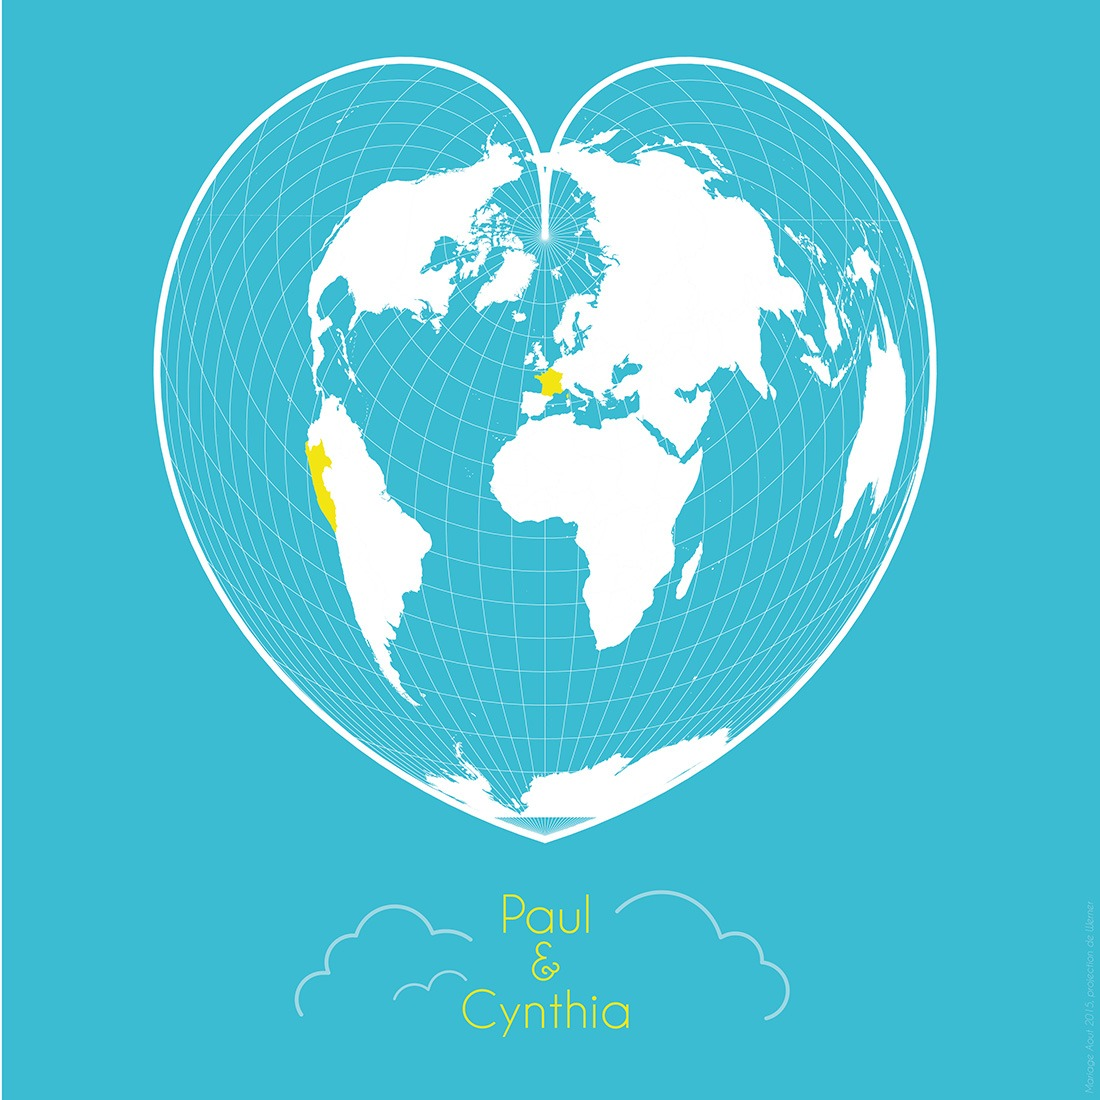 Carte mariage Paul & Cynthia - Guillaume Sciaux - Cartographe professionnel